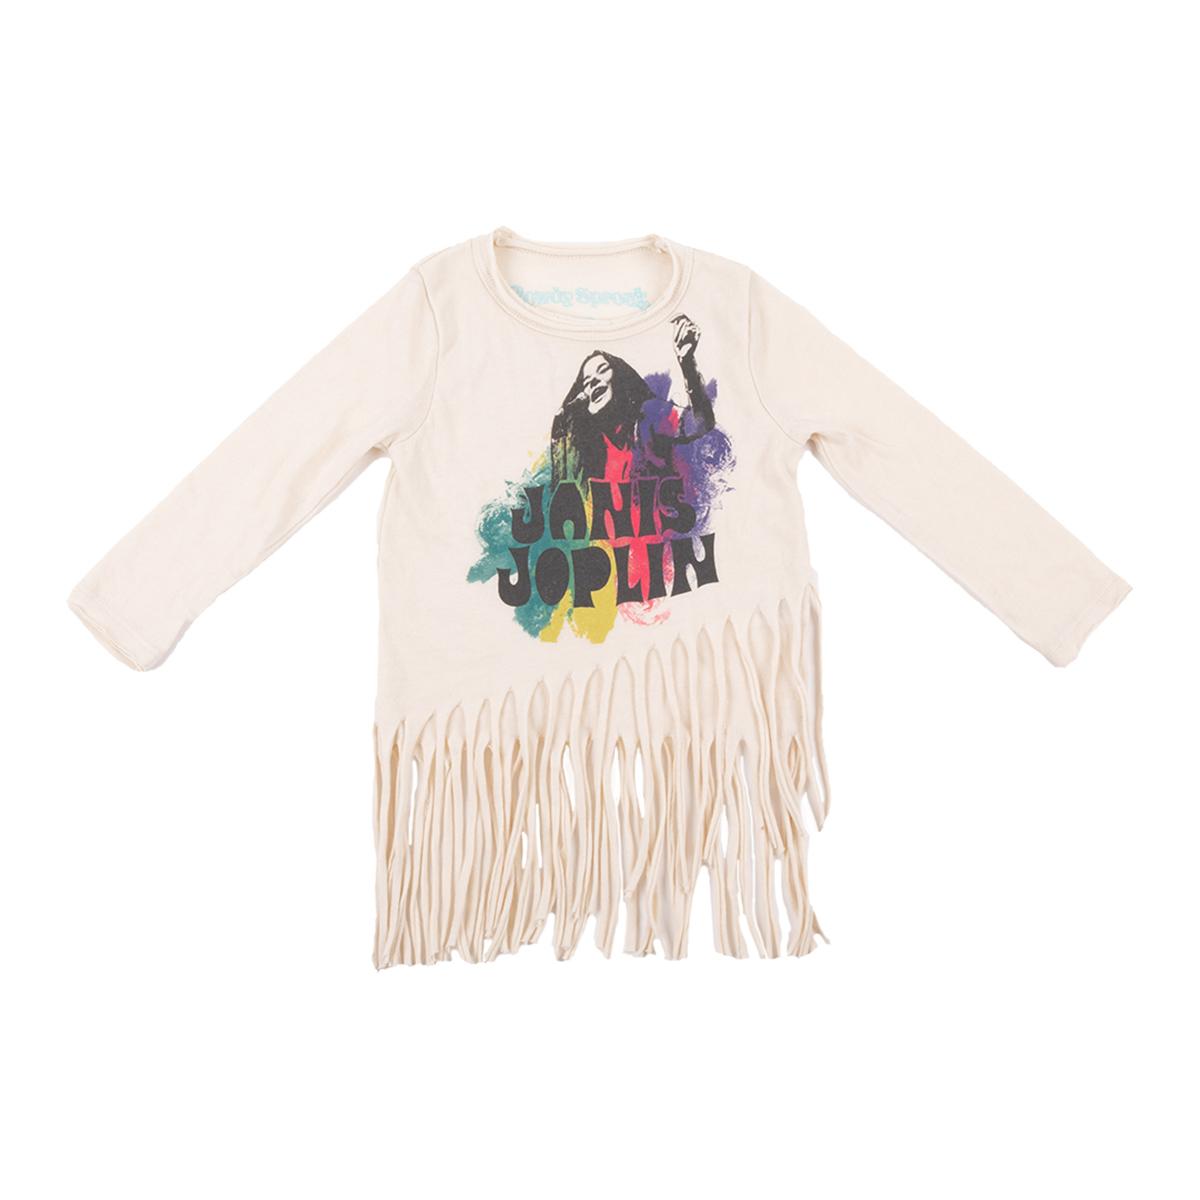 Janis Joplin Colorful Kids Long Sleeve Photo T-shirt with Fringe